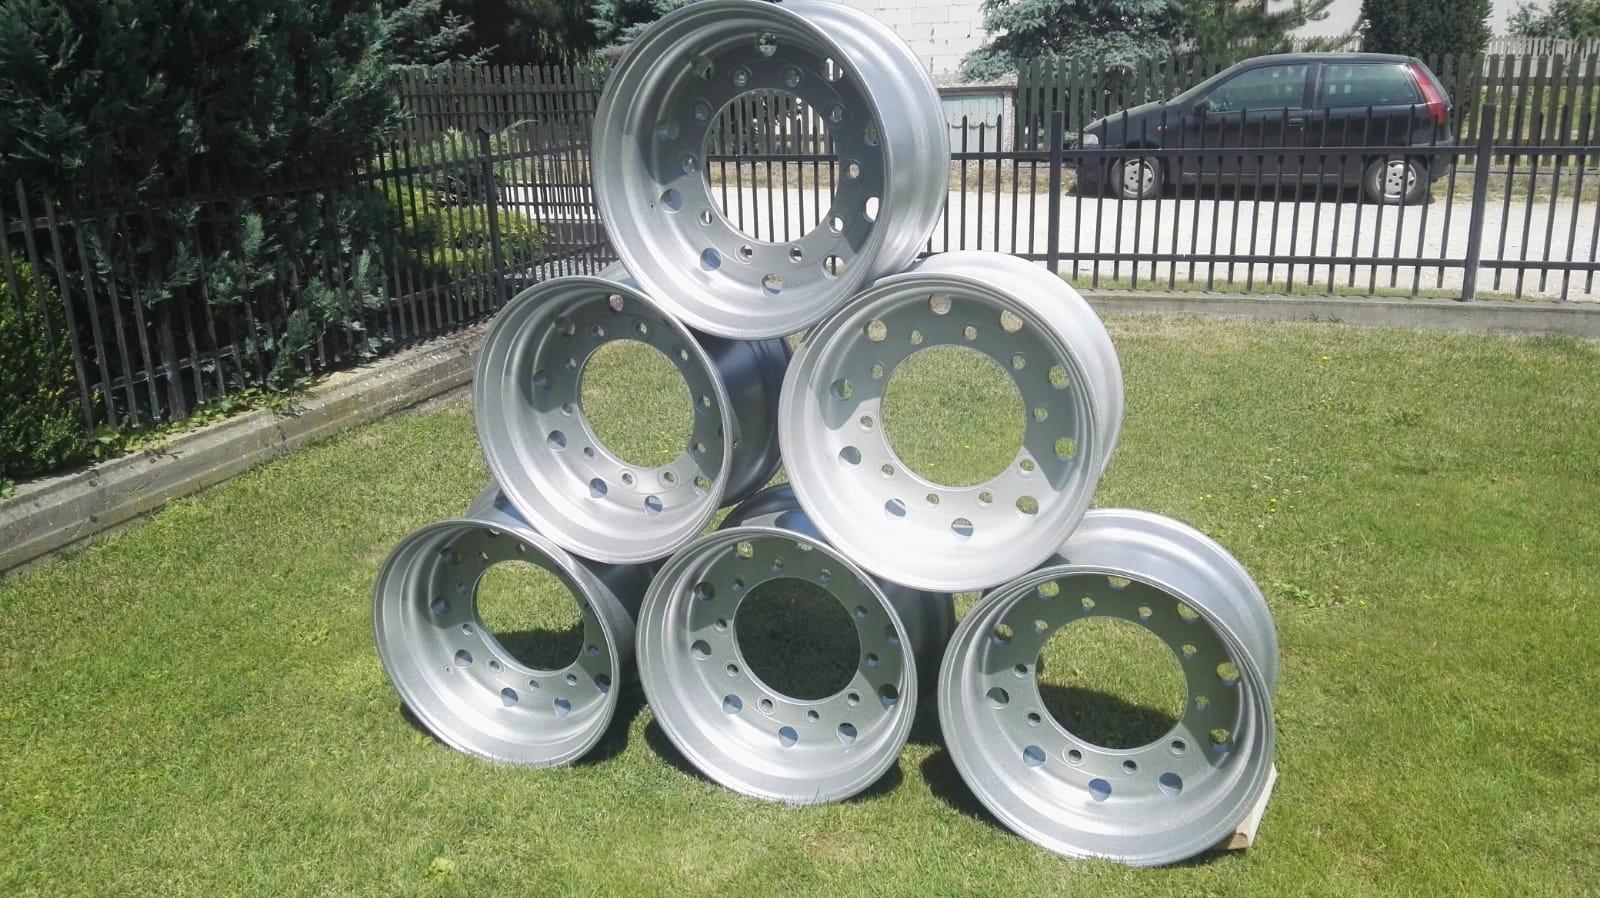 Felgi Aluminiowe Do Naczepy 7606811460 Oficjalne Archiwum Allegro